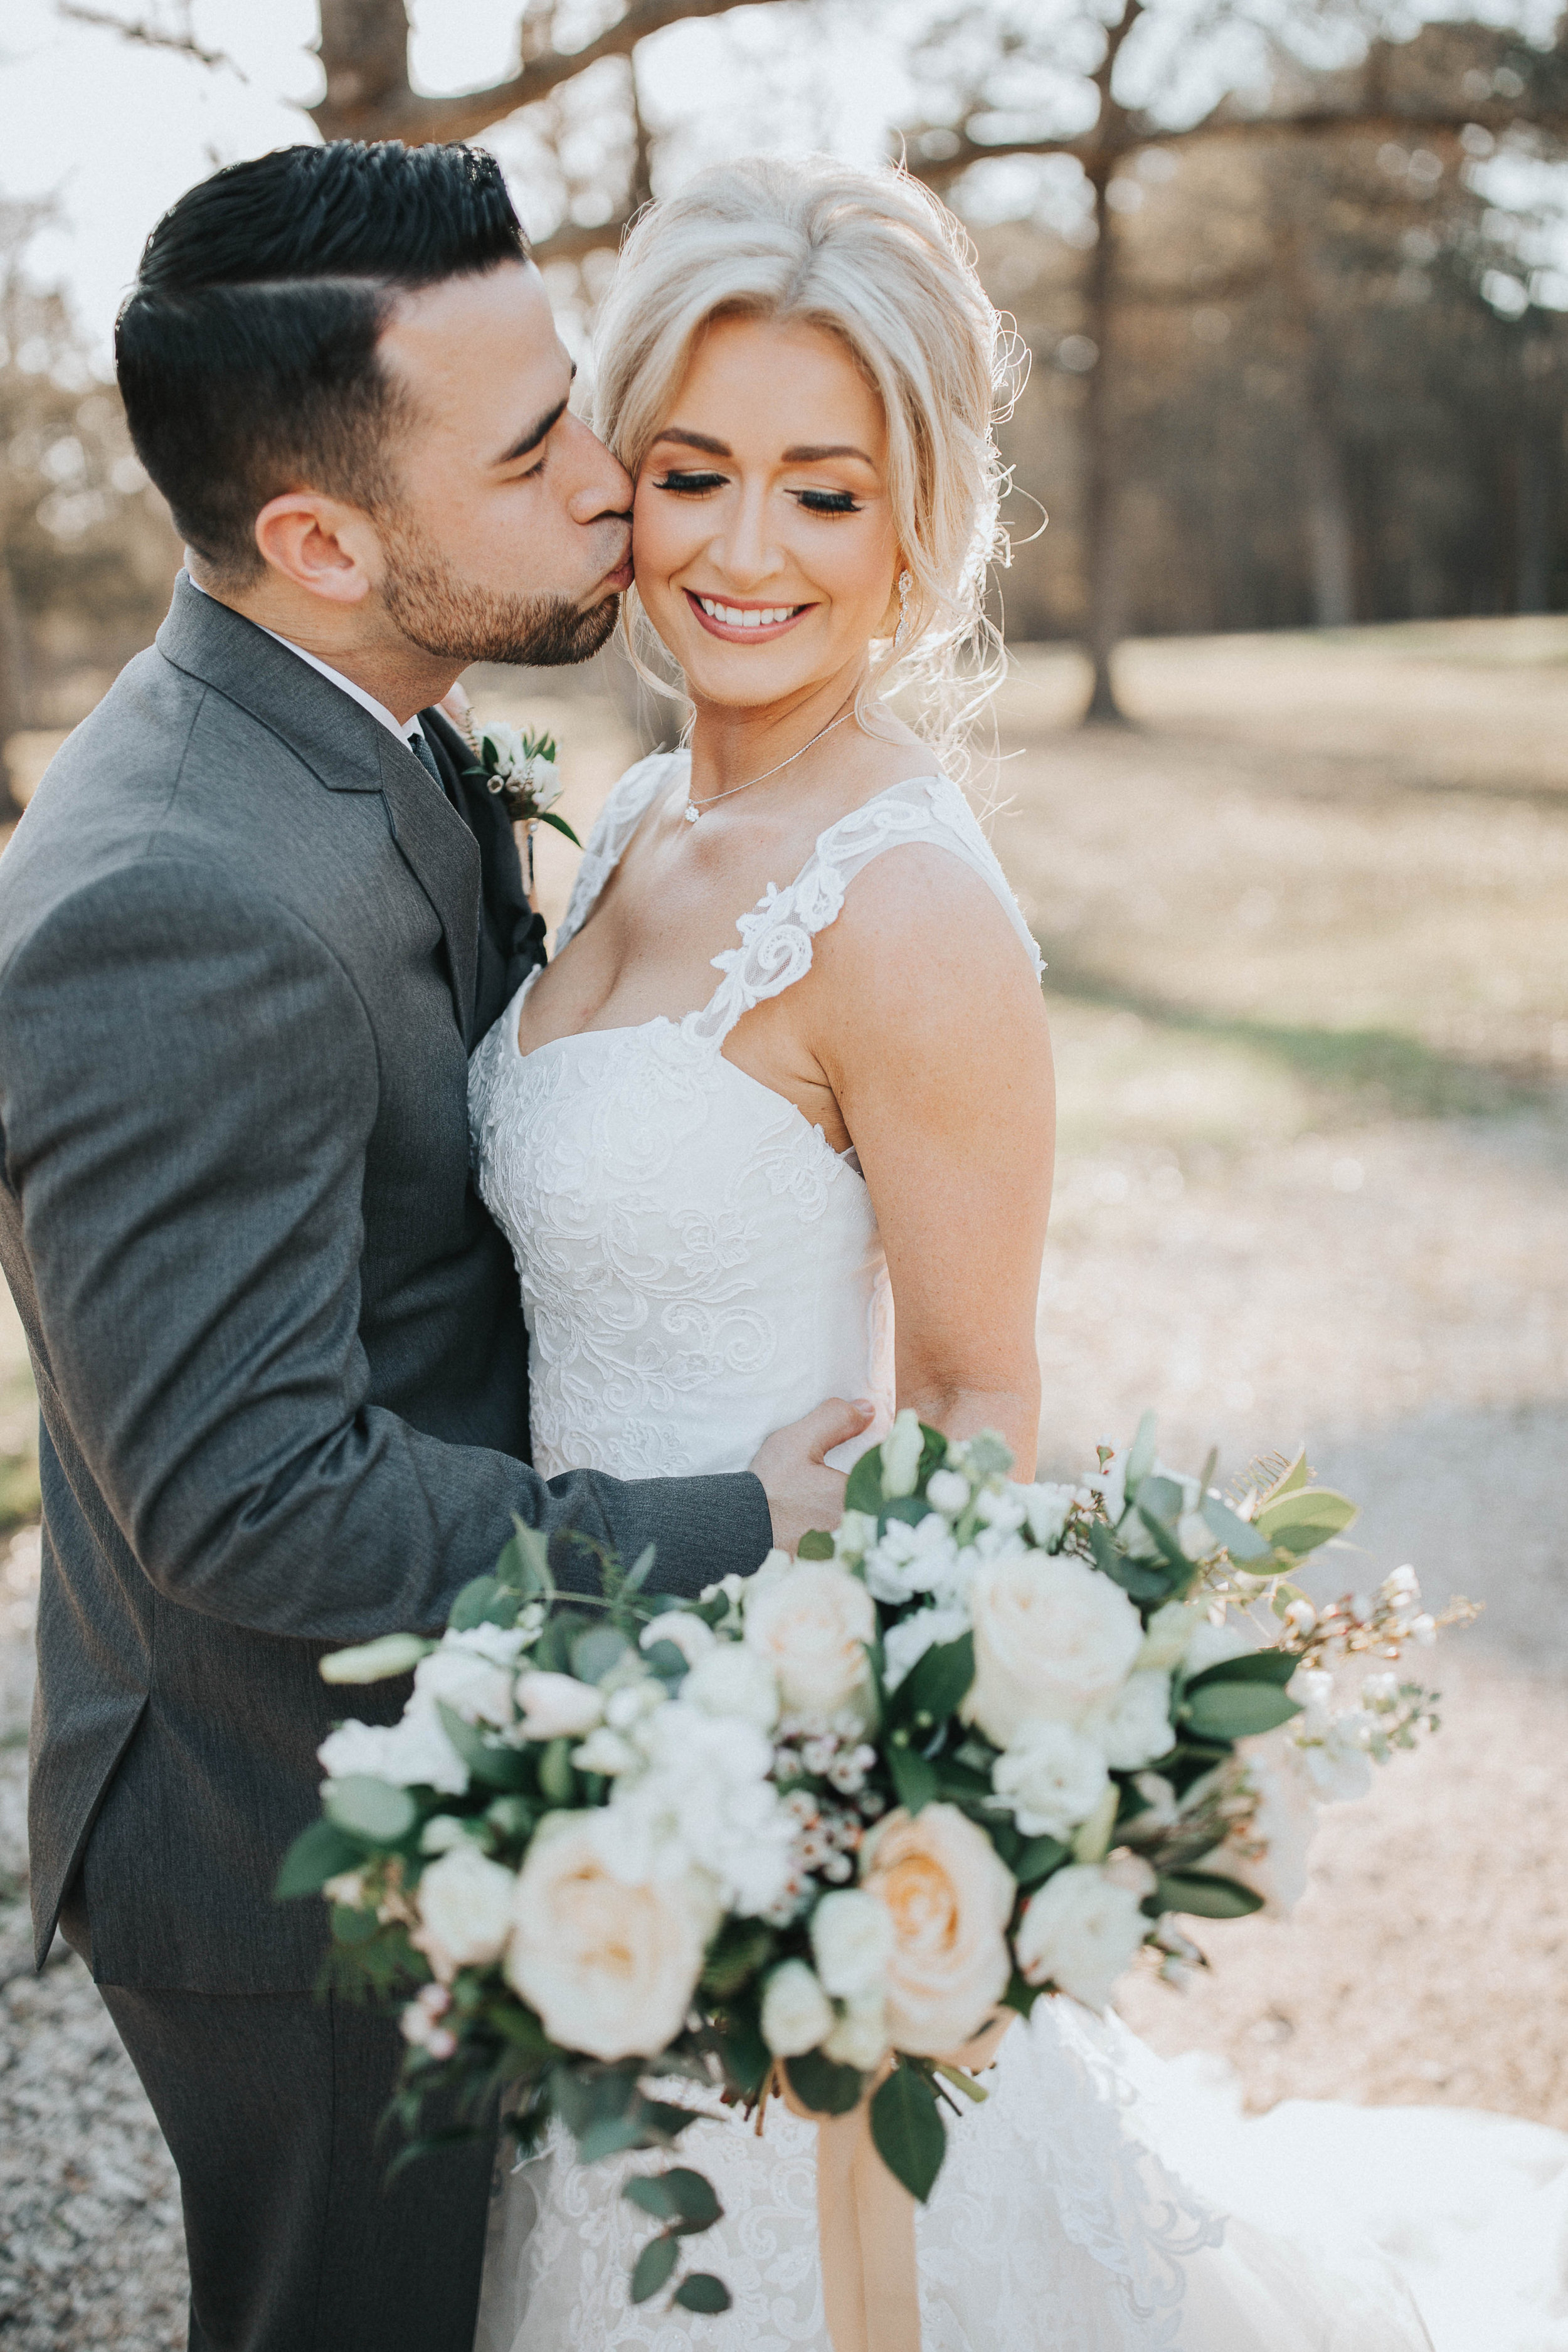 Melissa Bias Stephen Ontiveros Wedding 2 18 17-All Photos-0431.jpg